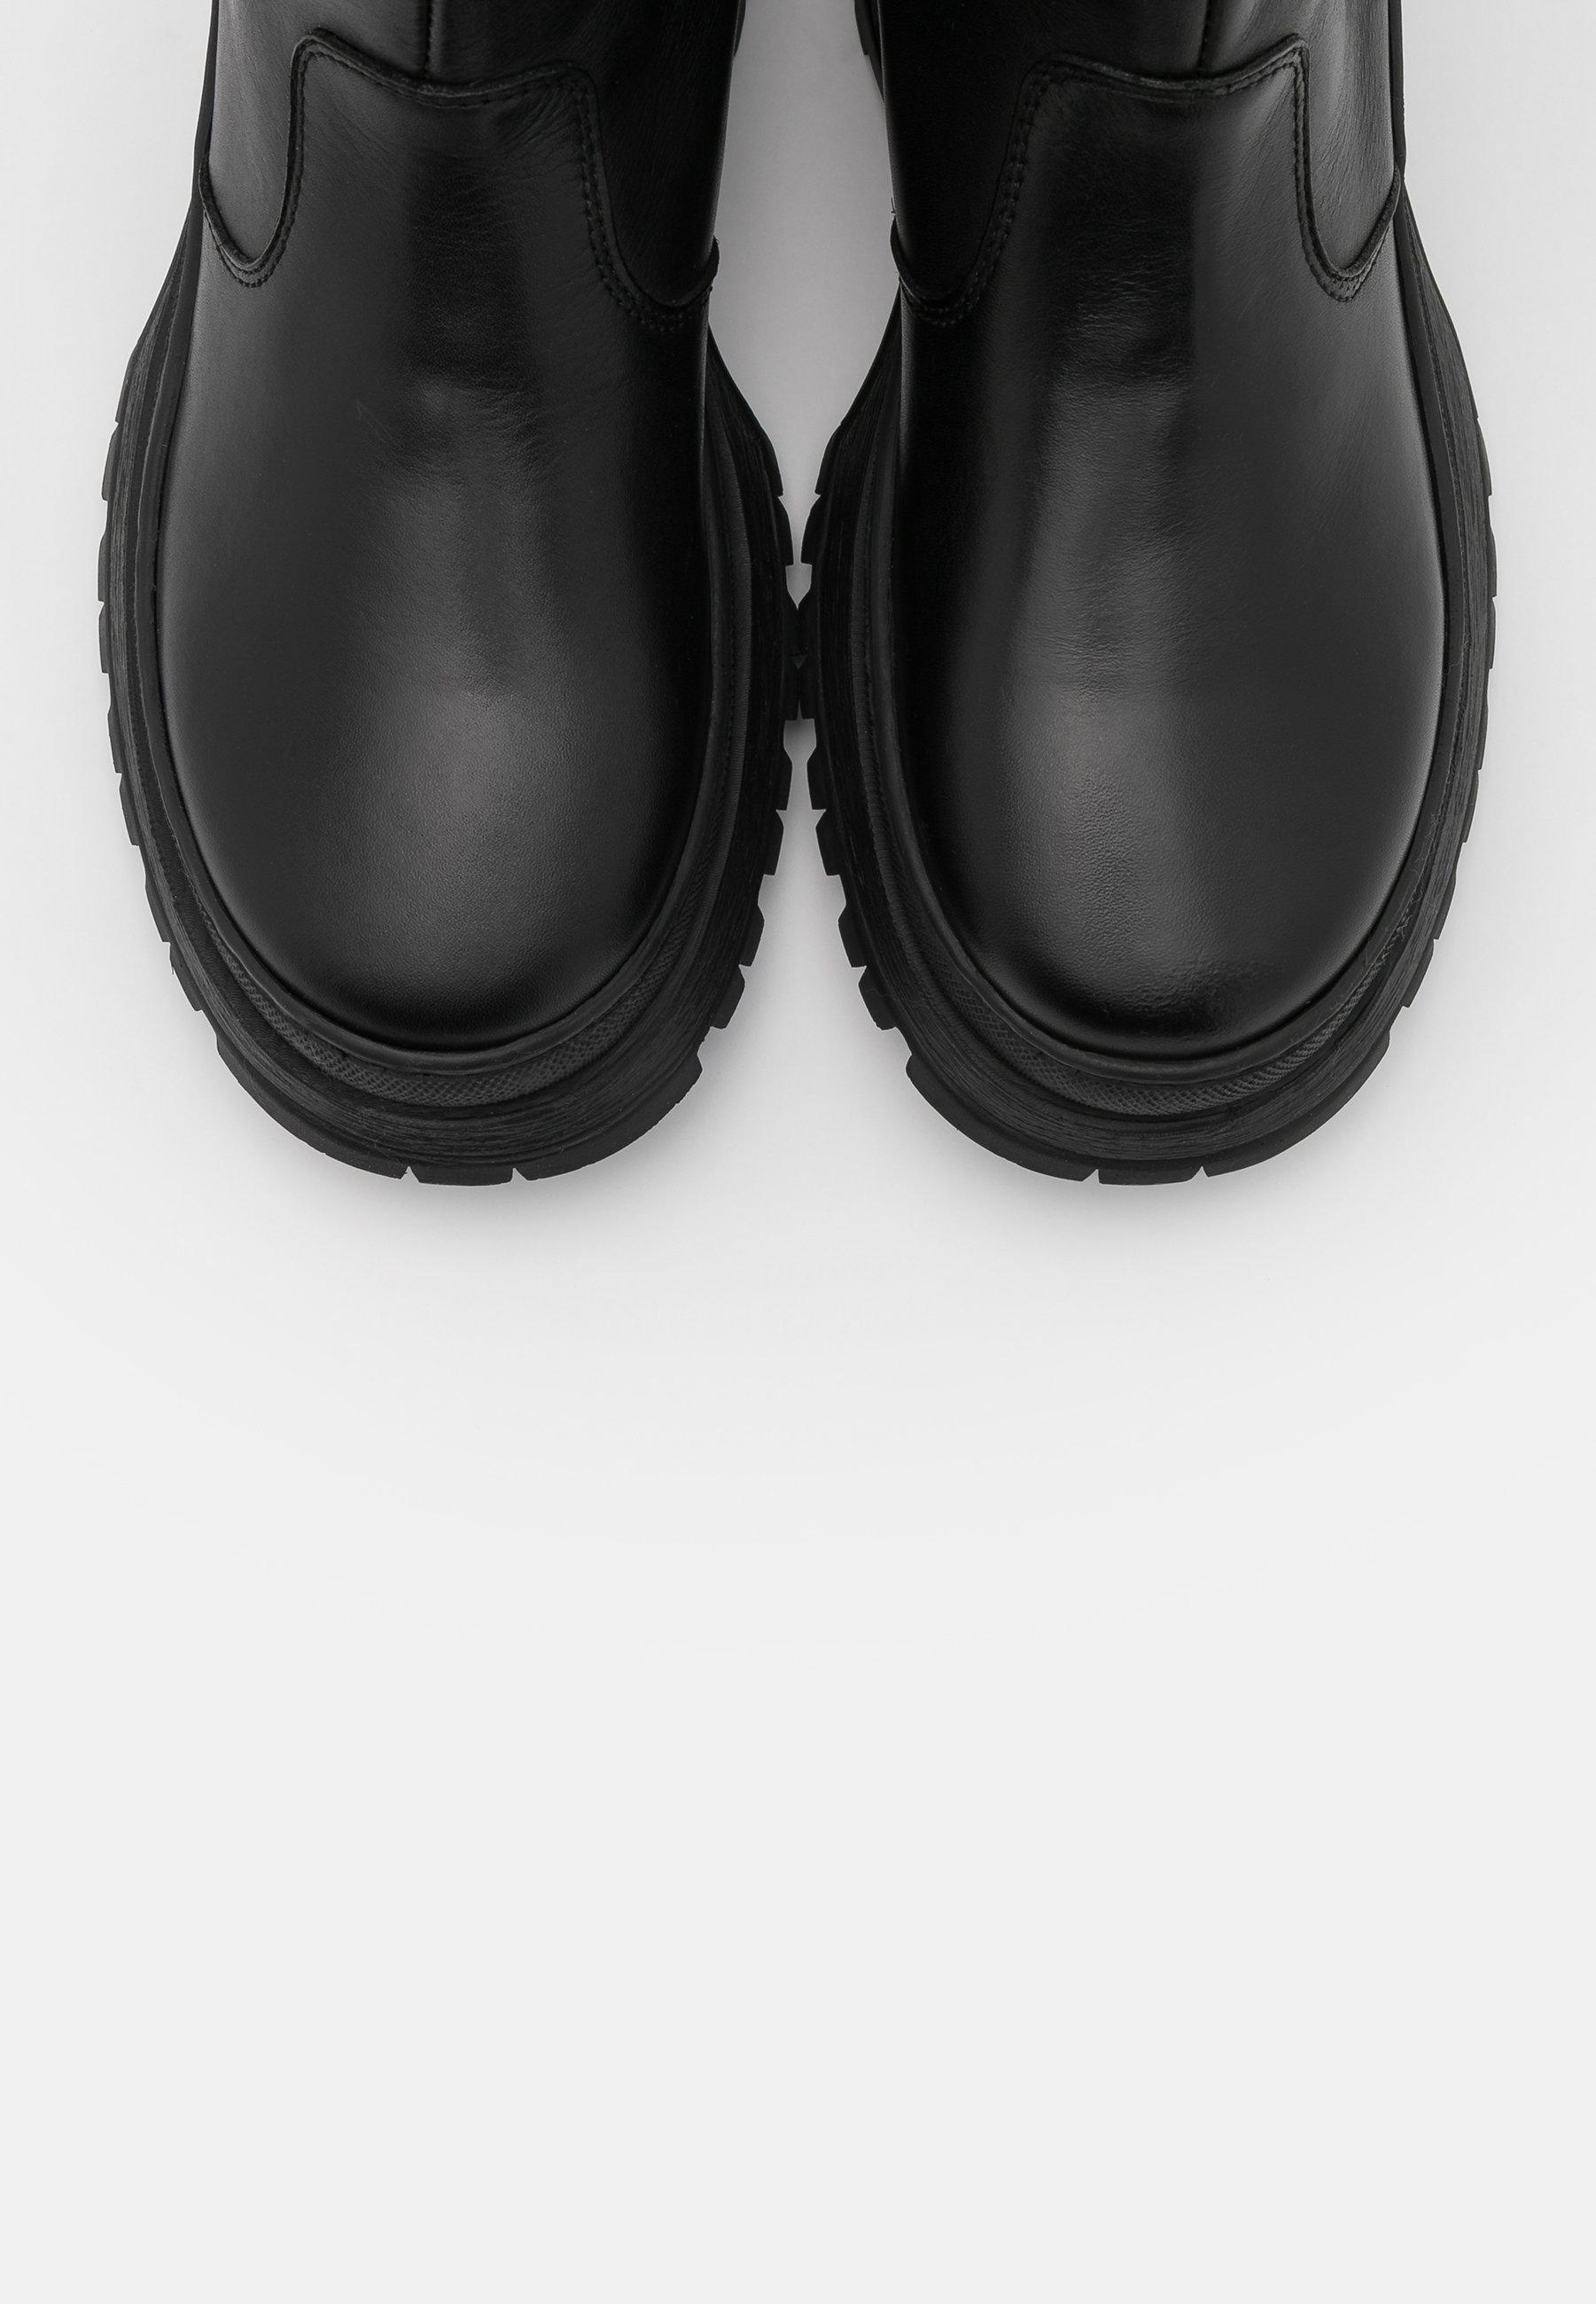 Pieces Psselione Boot - Platåstøvletter Black/svart